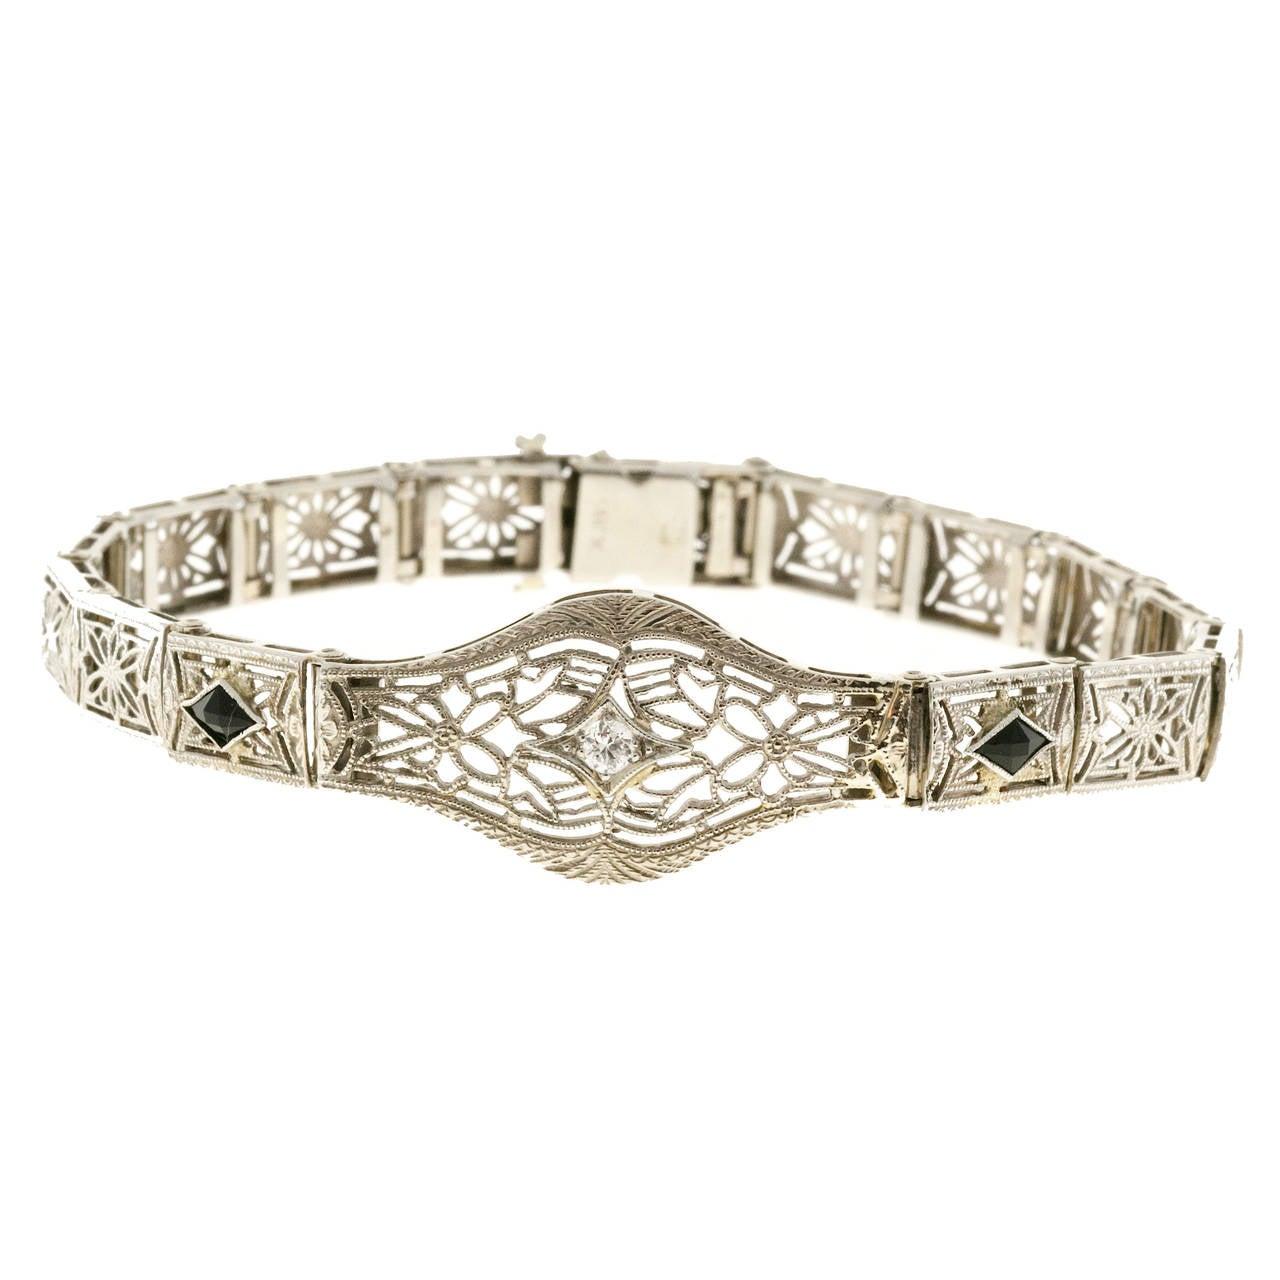 Diamond Calibre Sapphire White Gold Filigree Bracelet In Good Condition For Sale In Stamford, CT